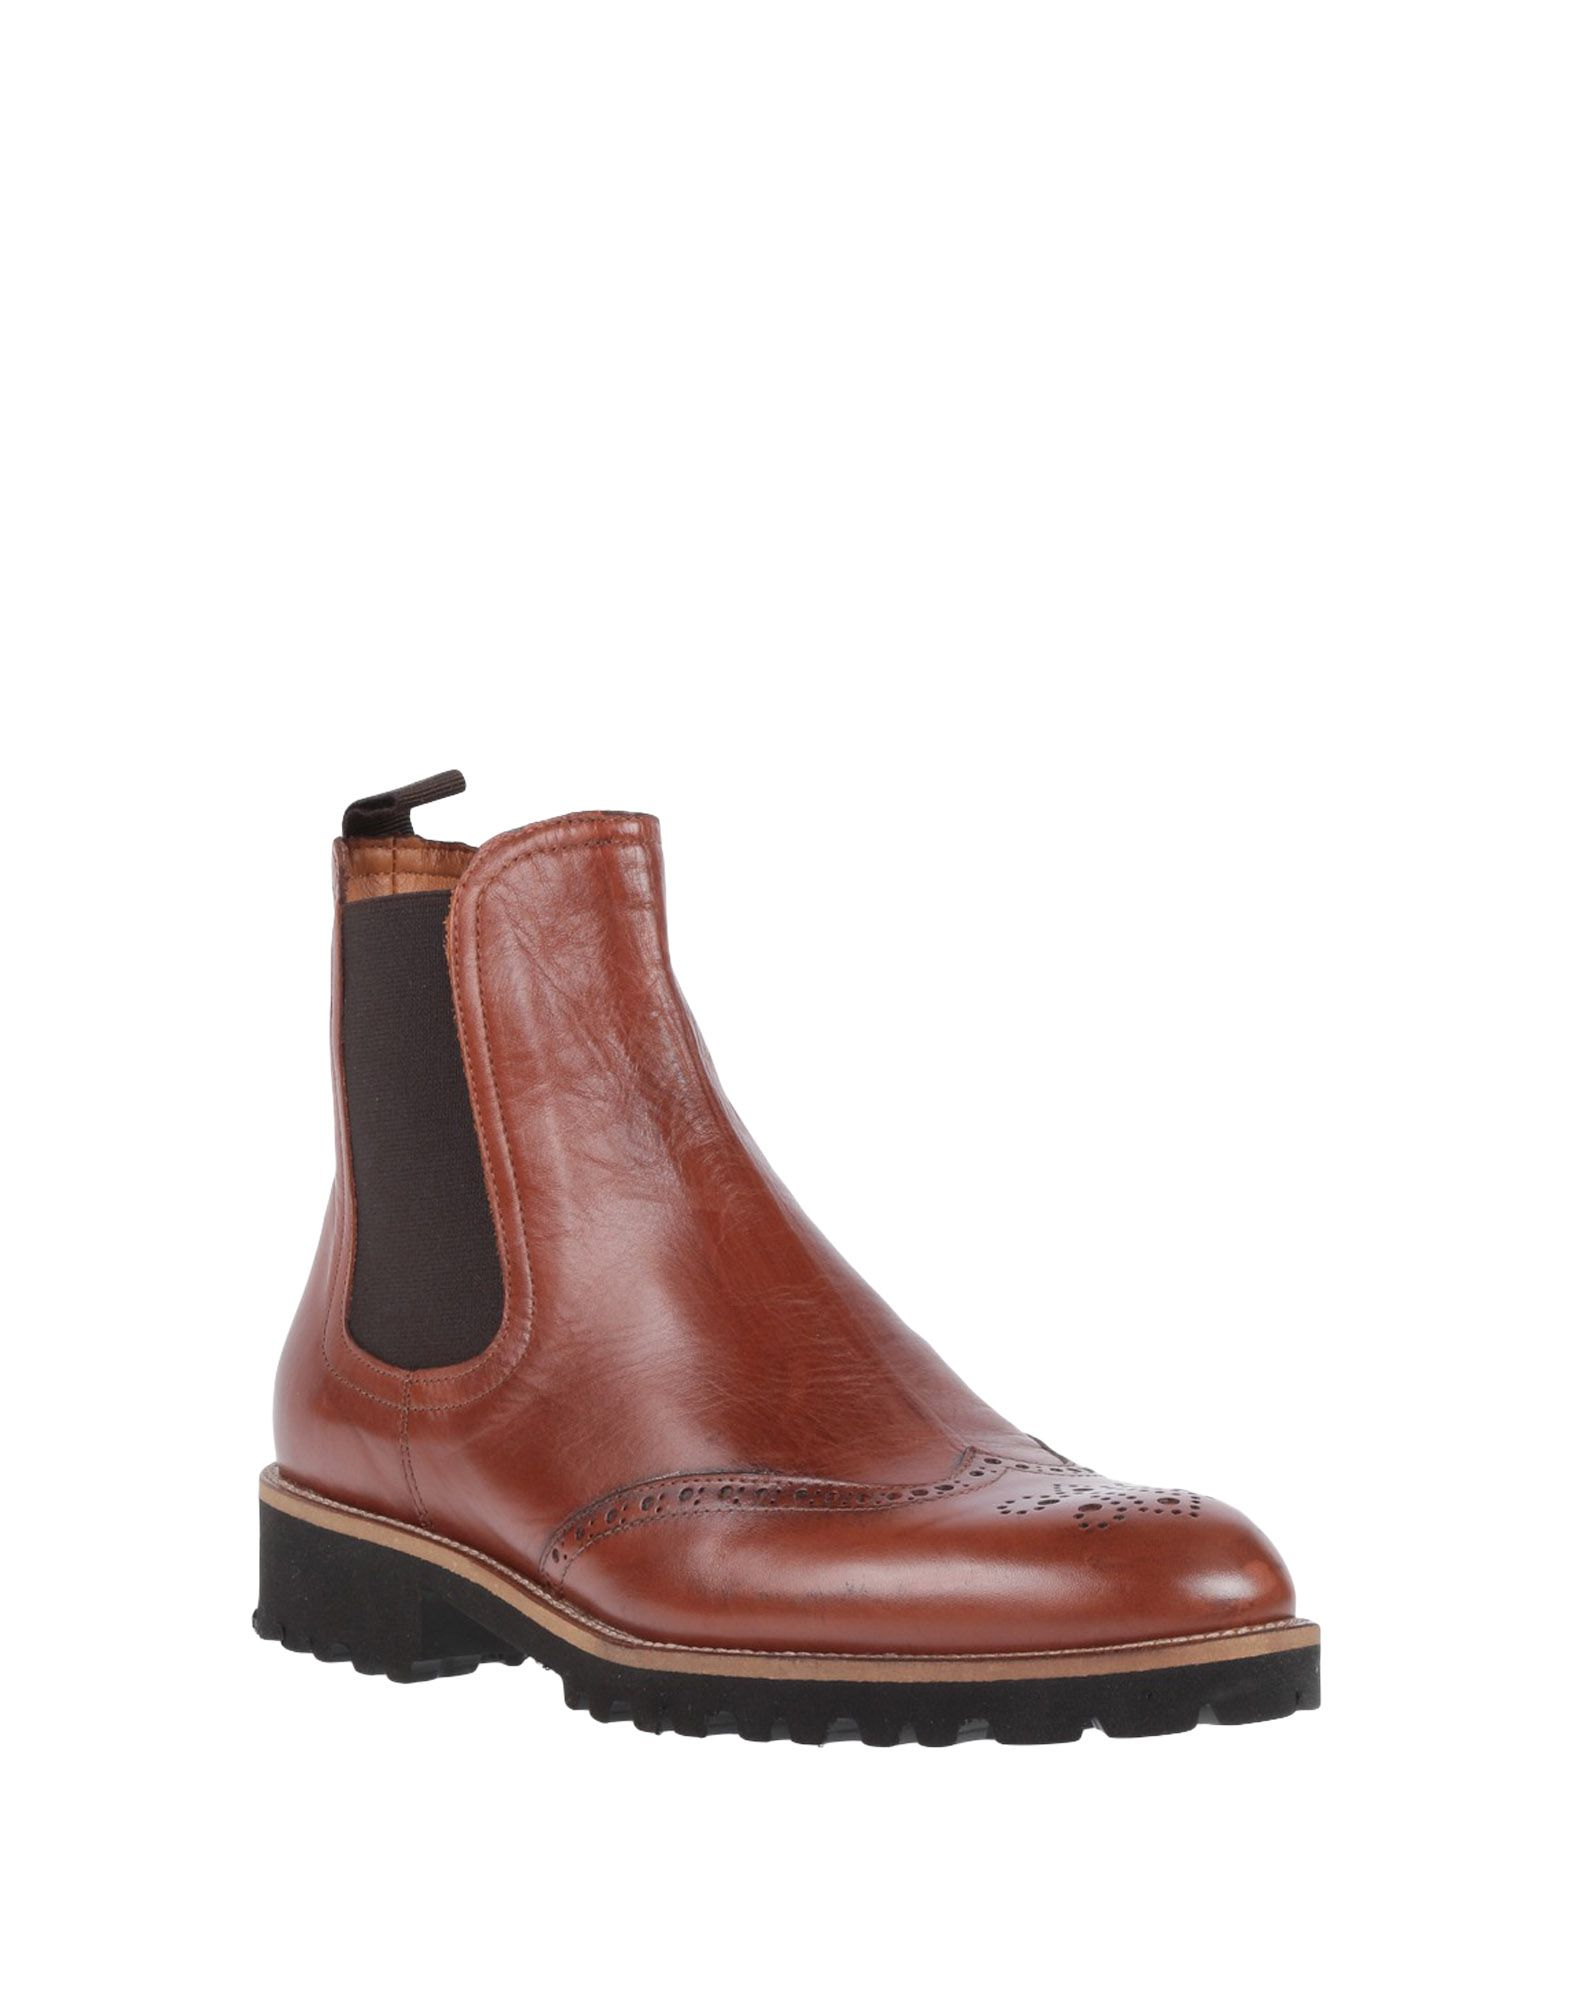 Gut tragenF.Lli um billige Schuhe zu tragenF.Lli Gut Rosana Chelsea Boots Damen  11522391BT f43408